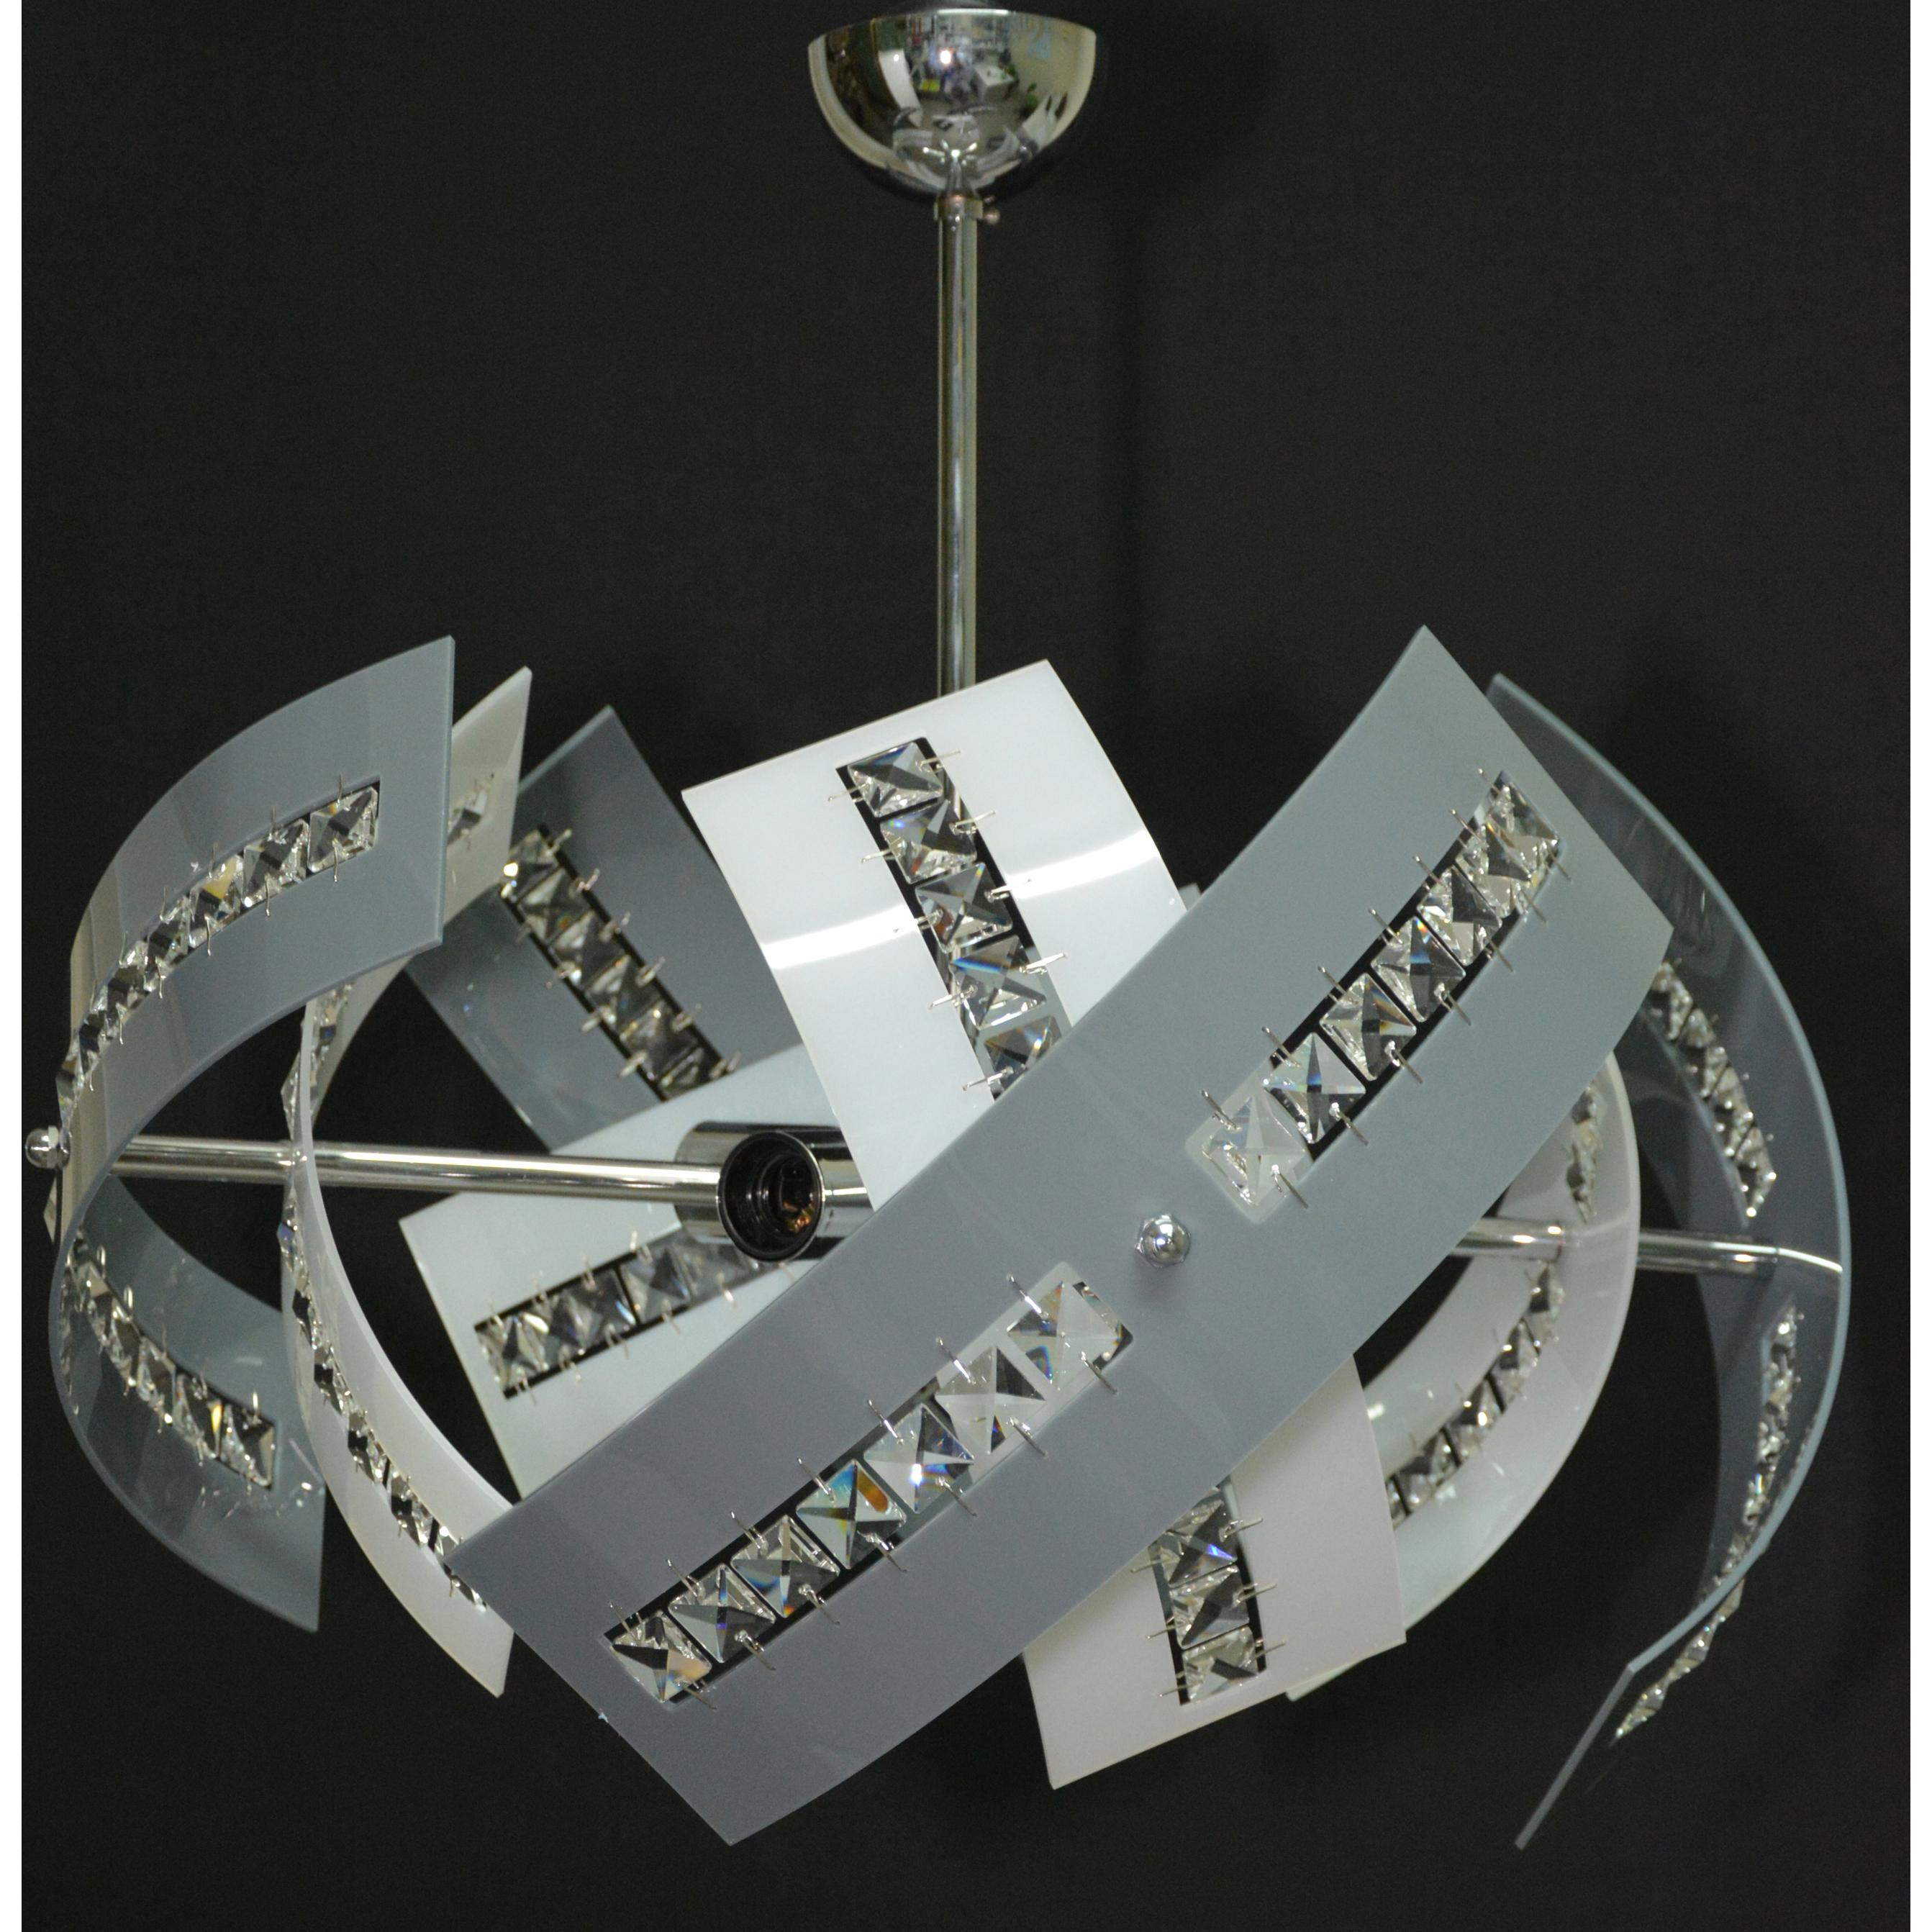 lampadari in plexiglass : LAMPADARIO IN PLEXIGLASS A FASCE(OL-01-4-SP) Primaluce Lampadari